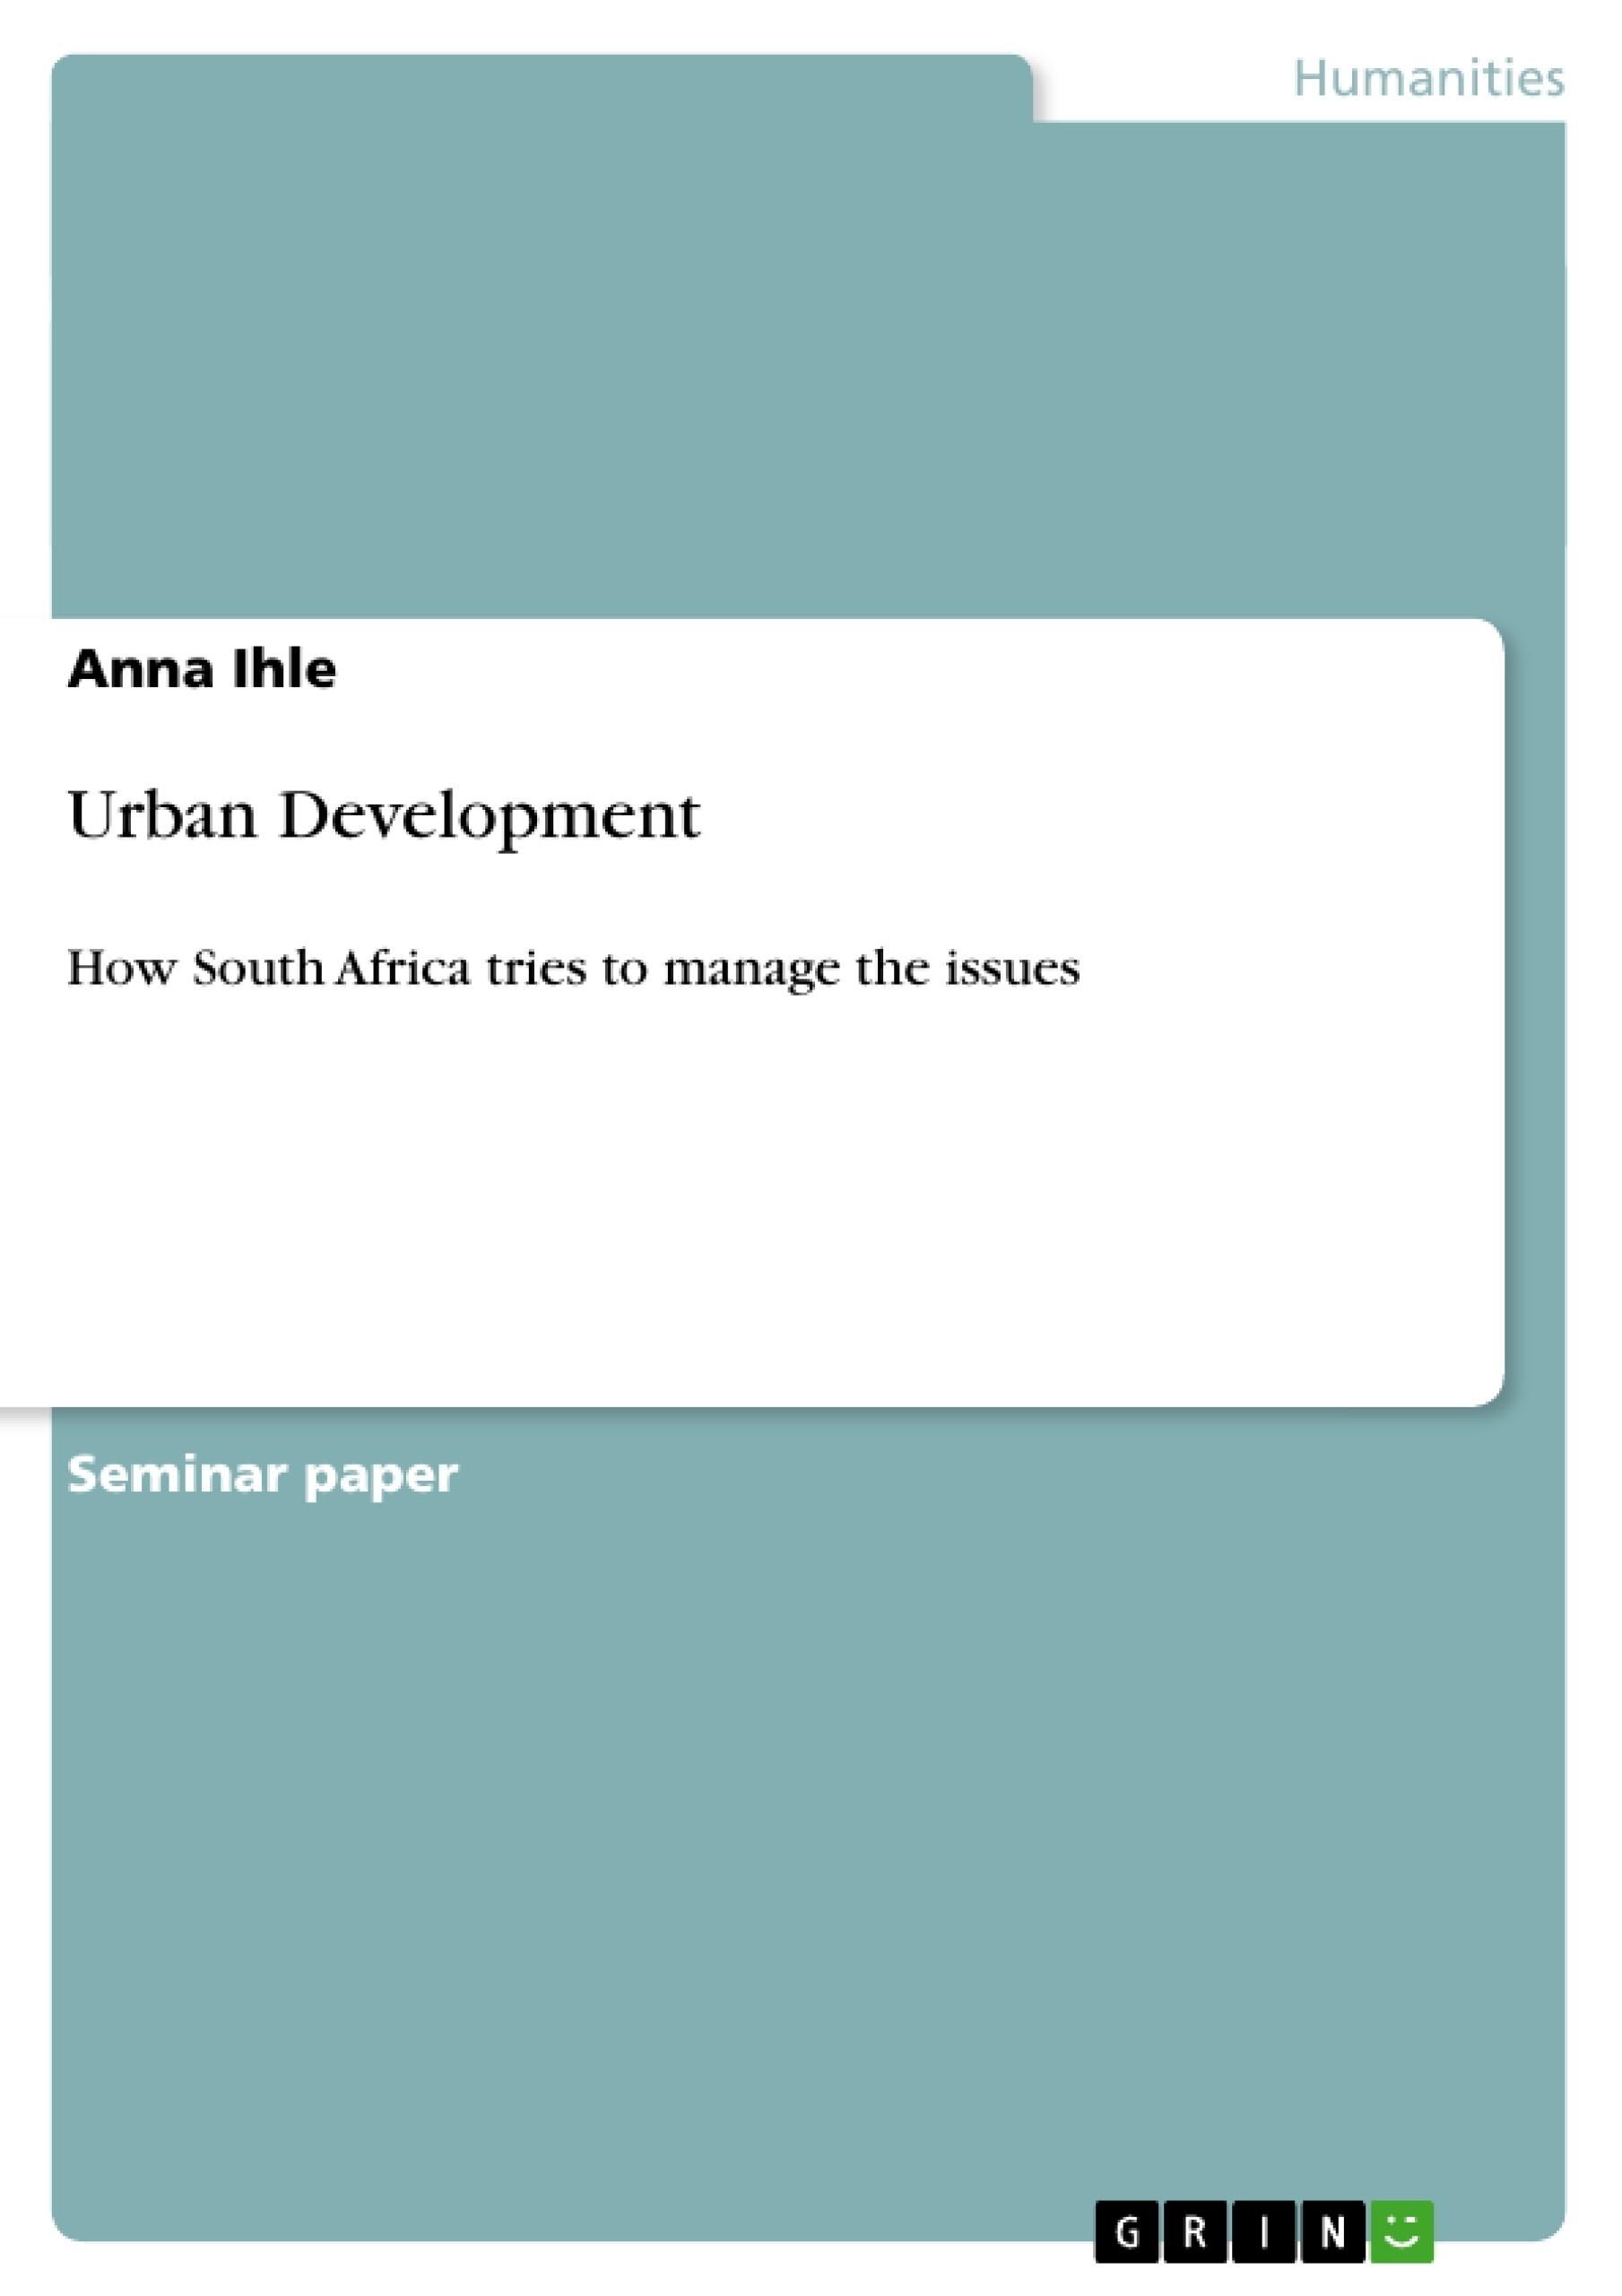 Title: Urban Development